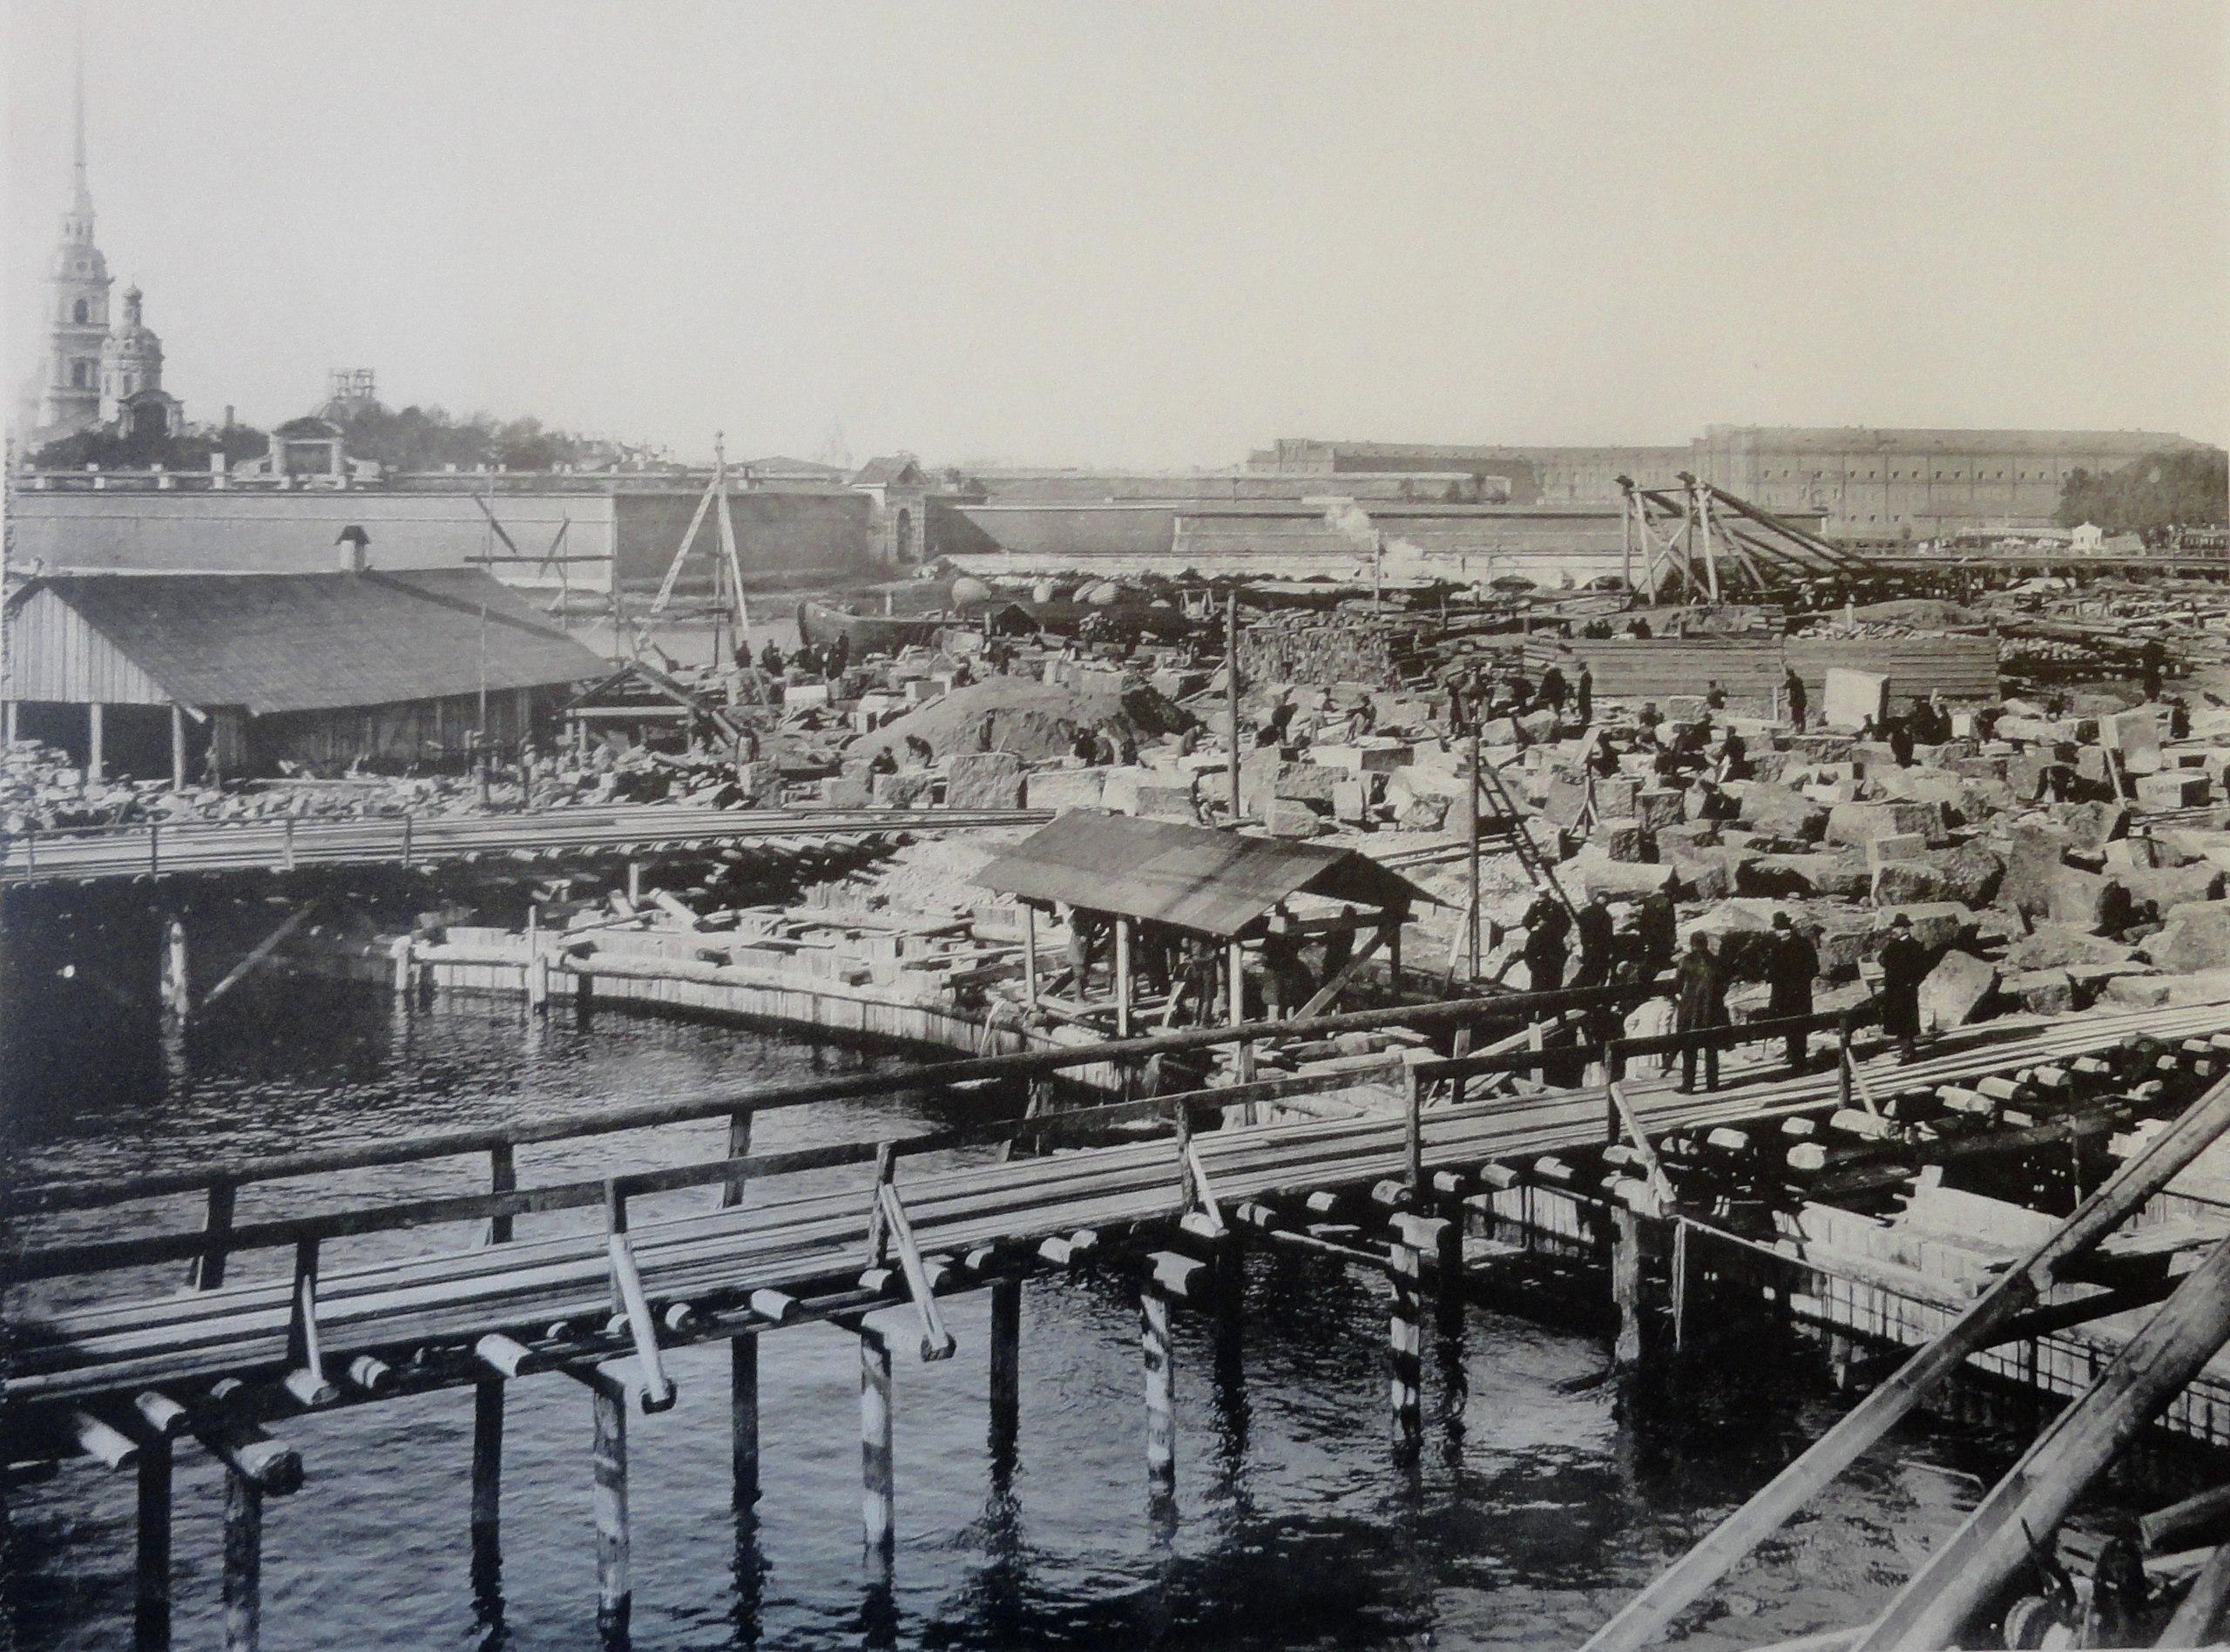 1900. Постройка съезда с дамбы на Троицкую площадь. 7 сентября